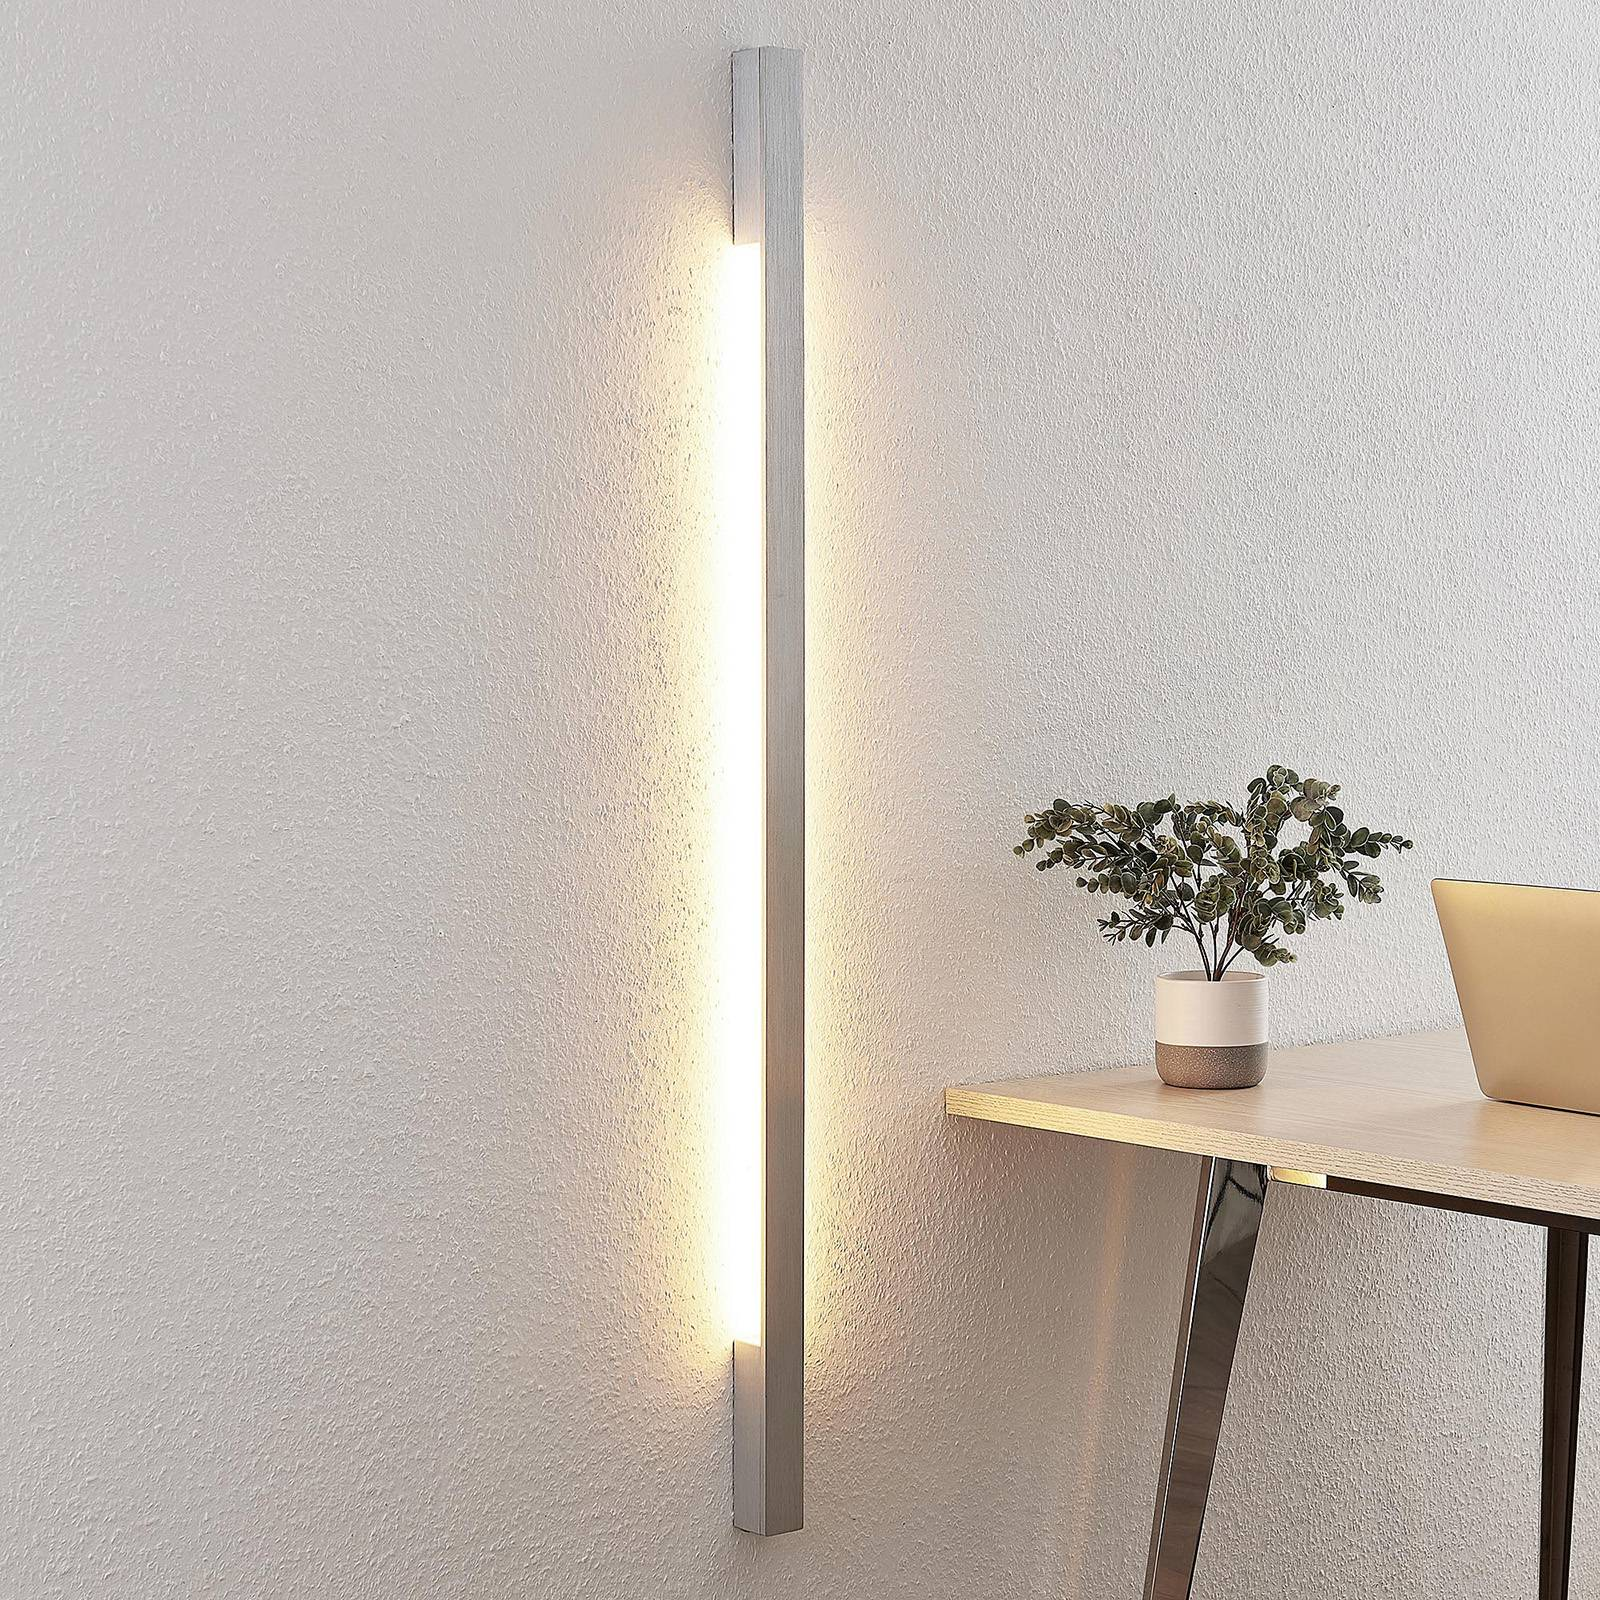 Arcchio Ivano -LED-seinävalaisin 130 cm, alumiini